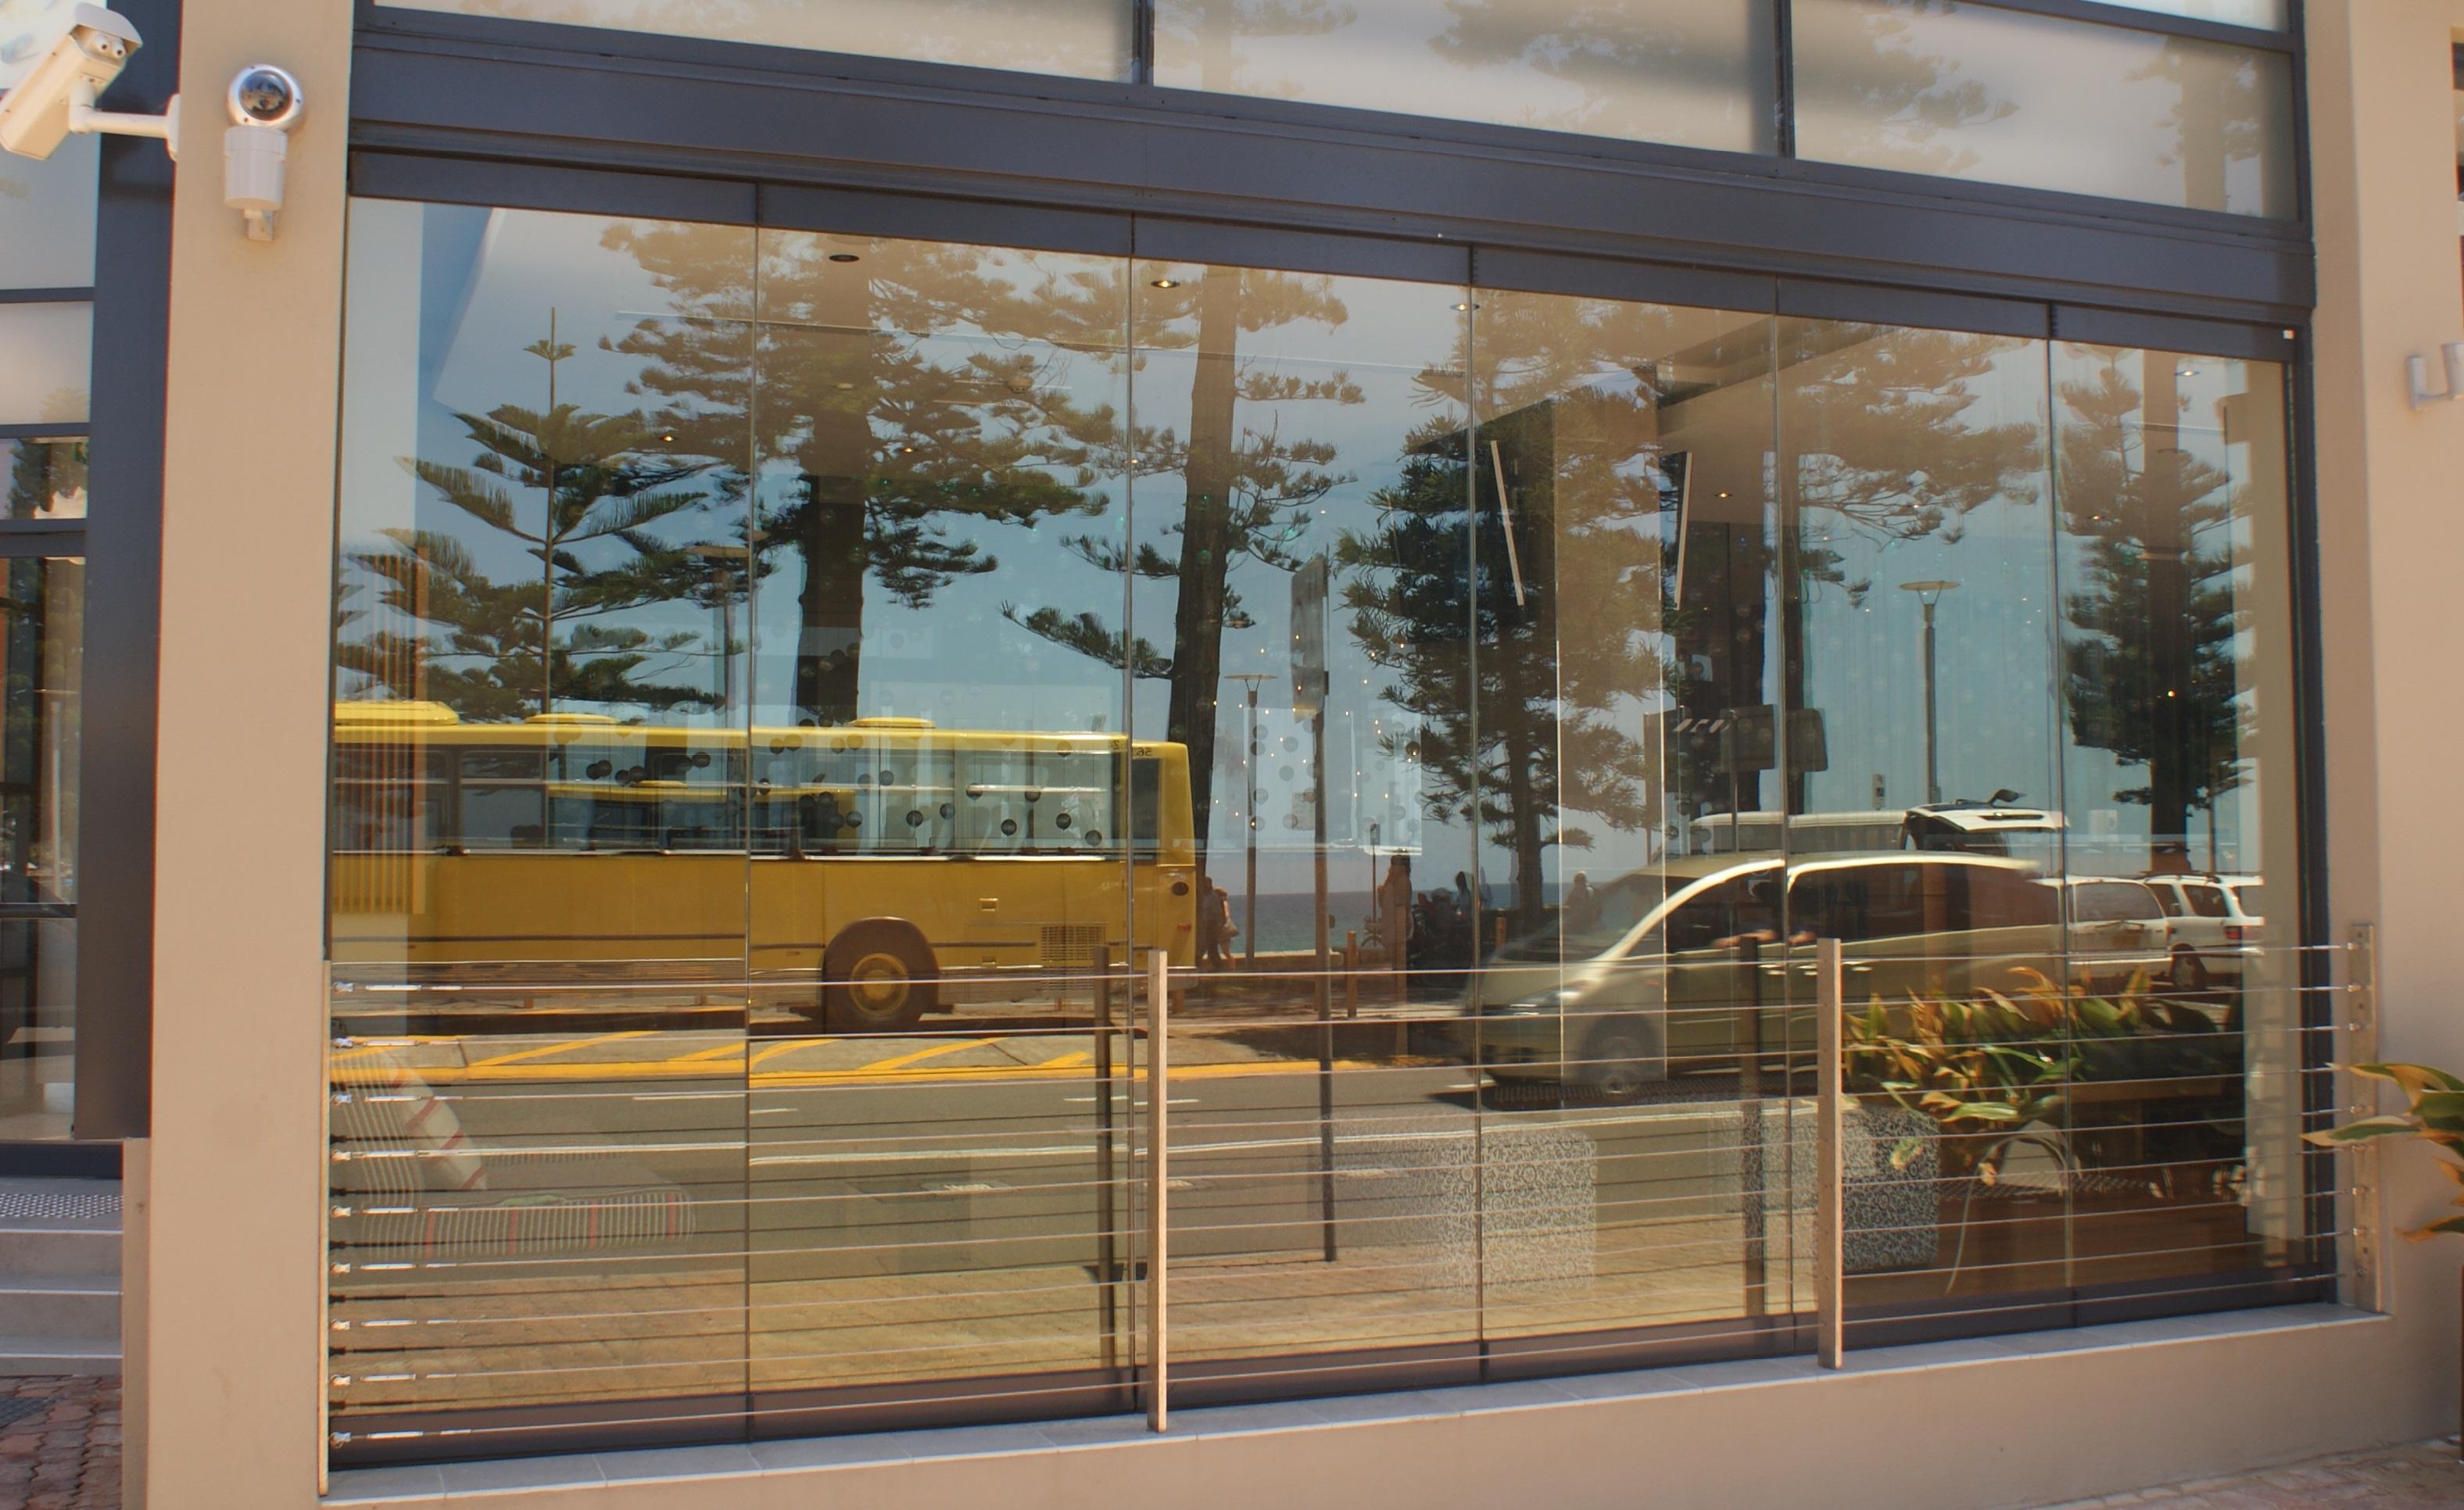 Top Hung Parking 187 Doors 187 Commercial 187 Central Coast Shop